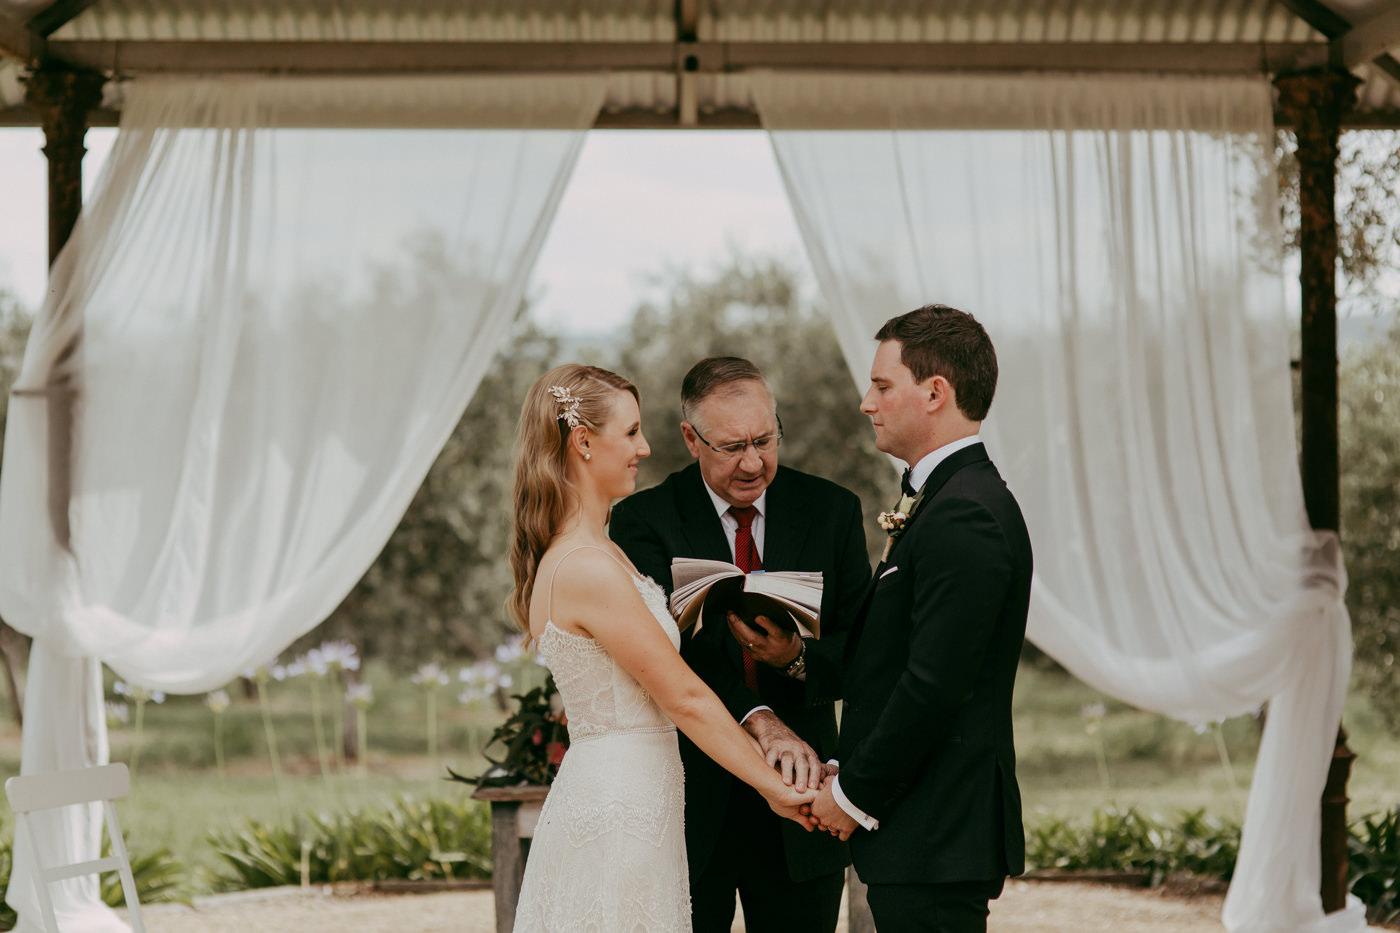 Anthony & Eliet - Wagga Wagga Wedding - Country NSW - Samantha Heather Photography-107.jpg